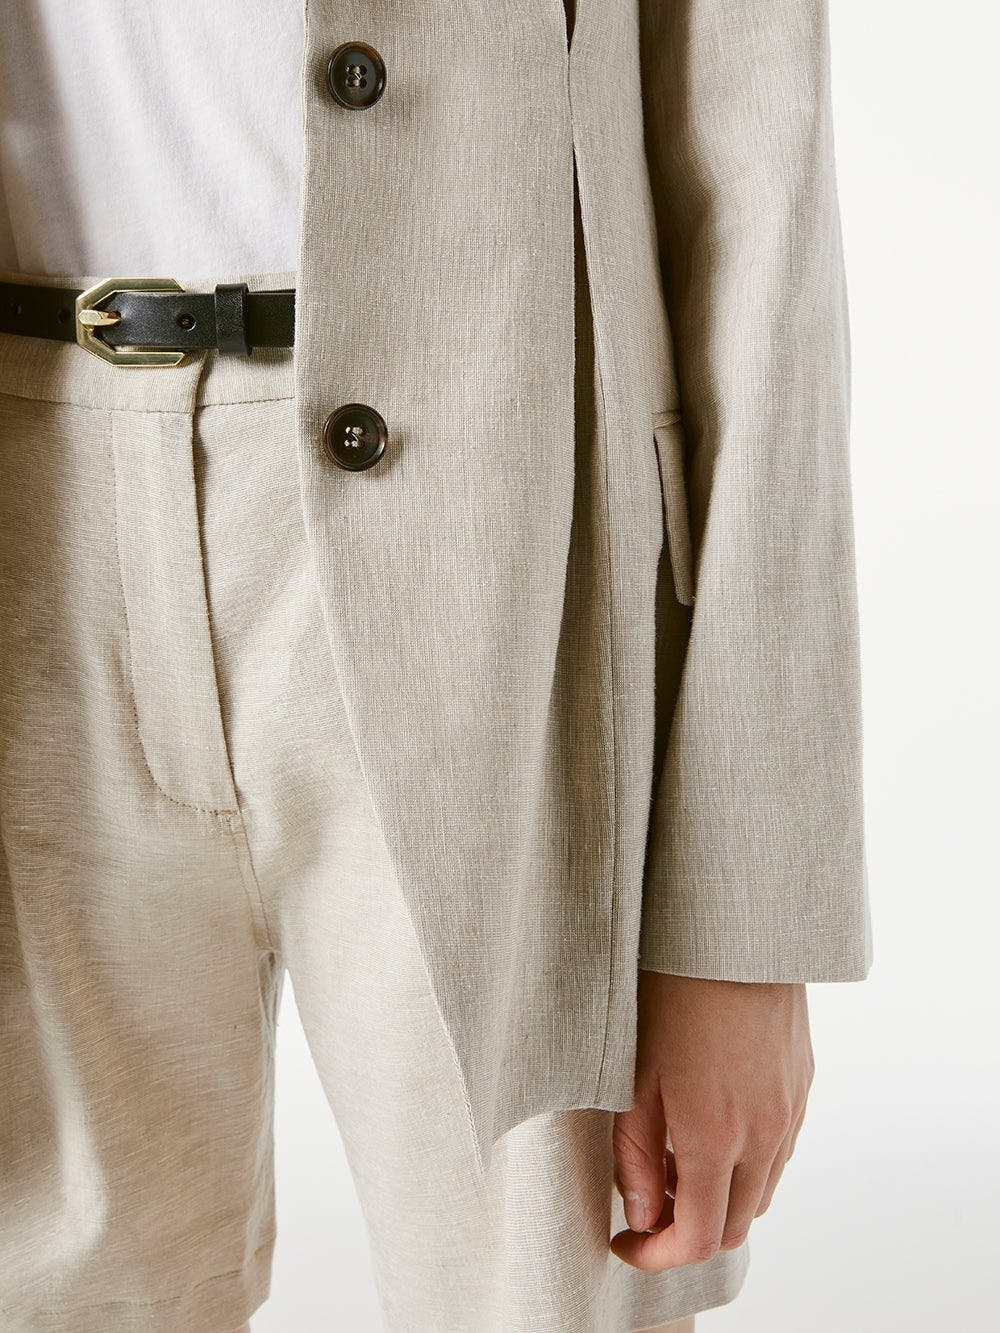 jacket detail view 2